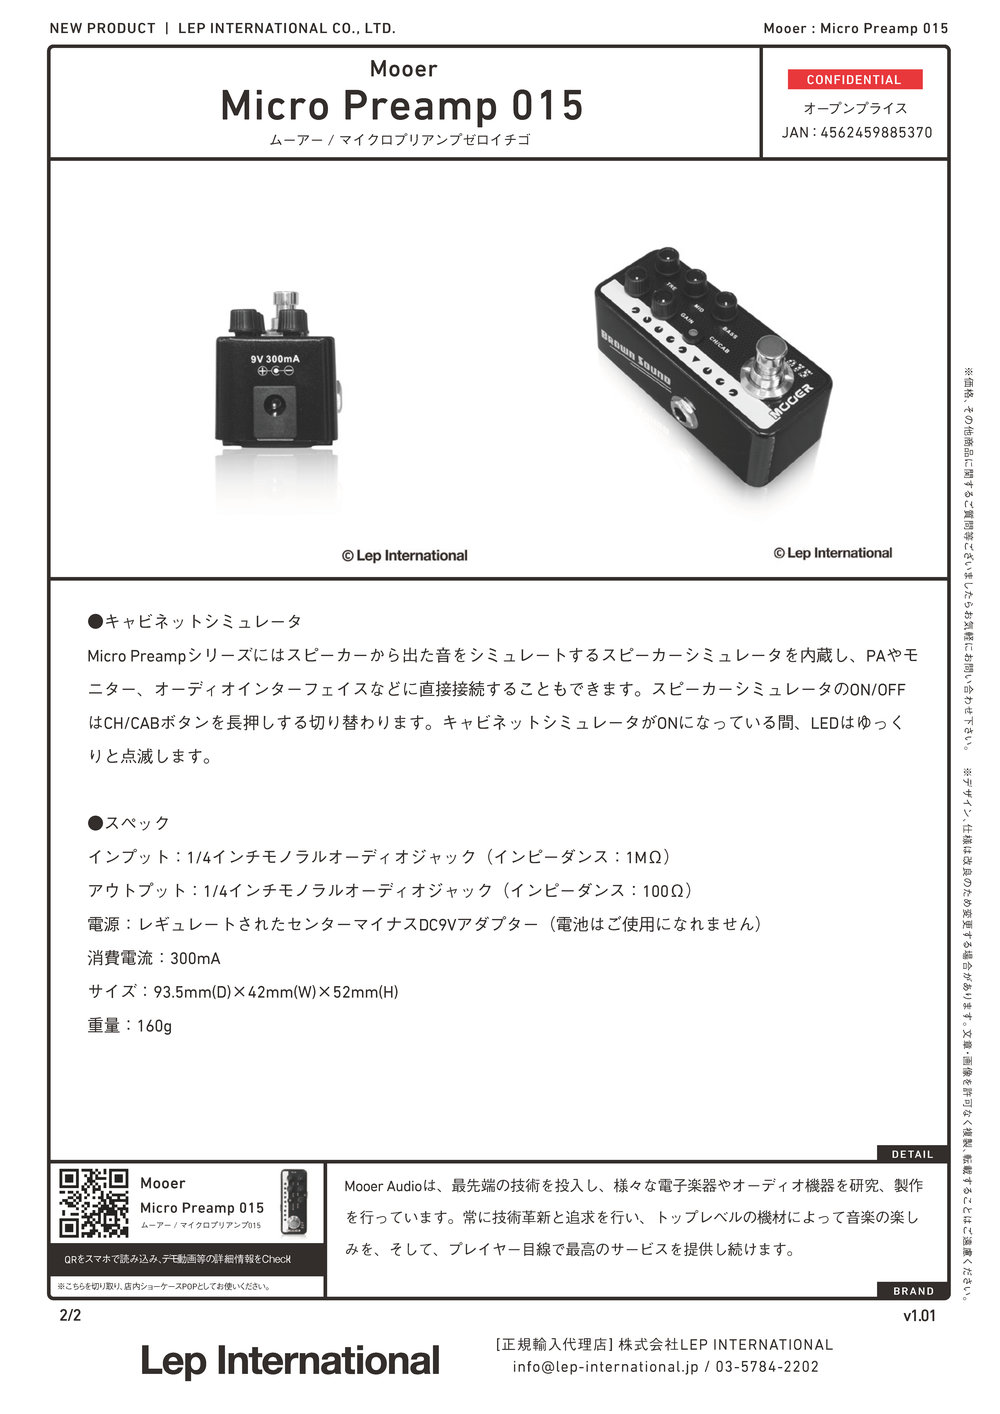 mooer micropreamp015 v1.01_ページ_2.jpg